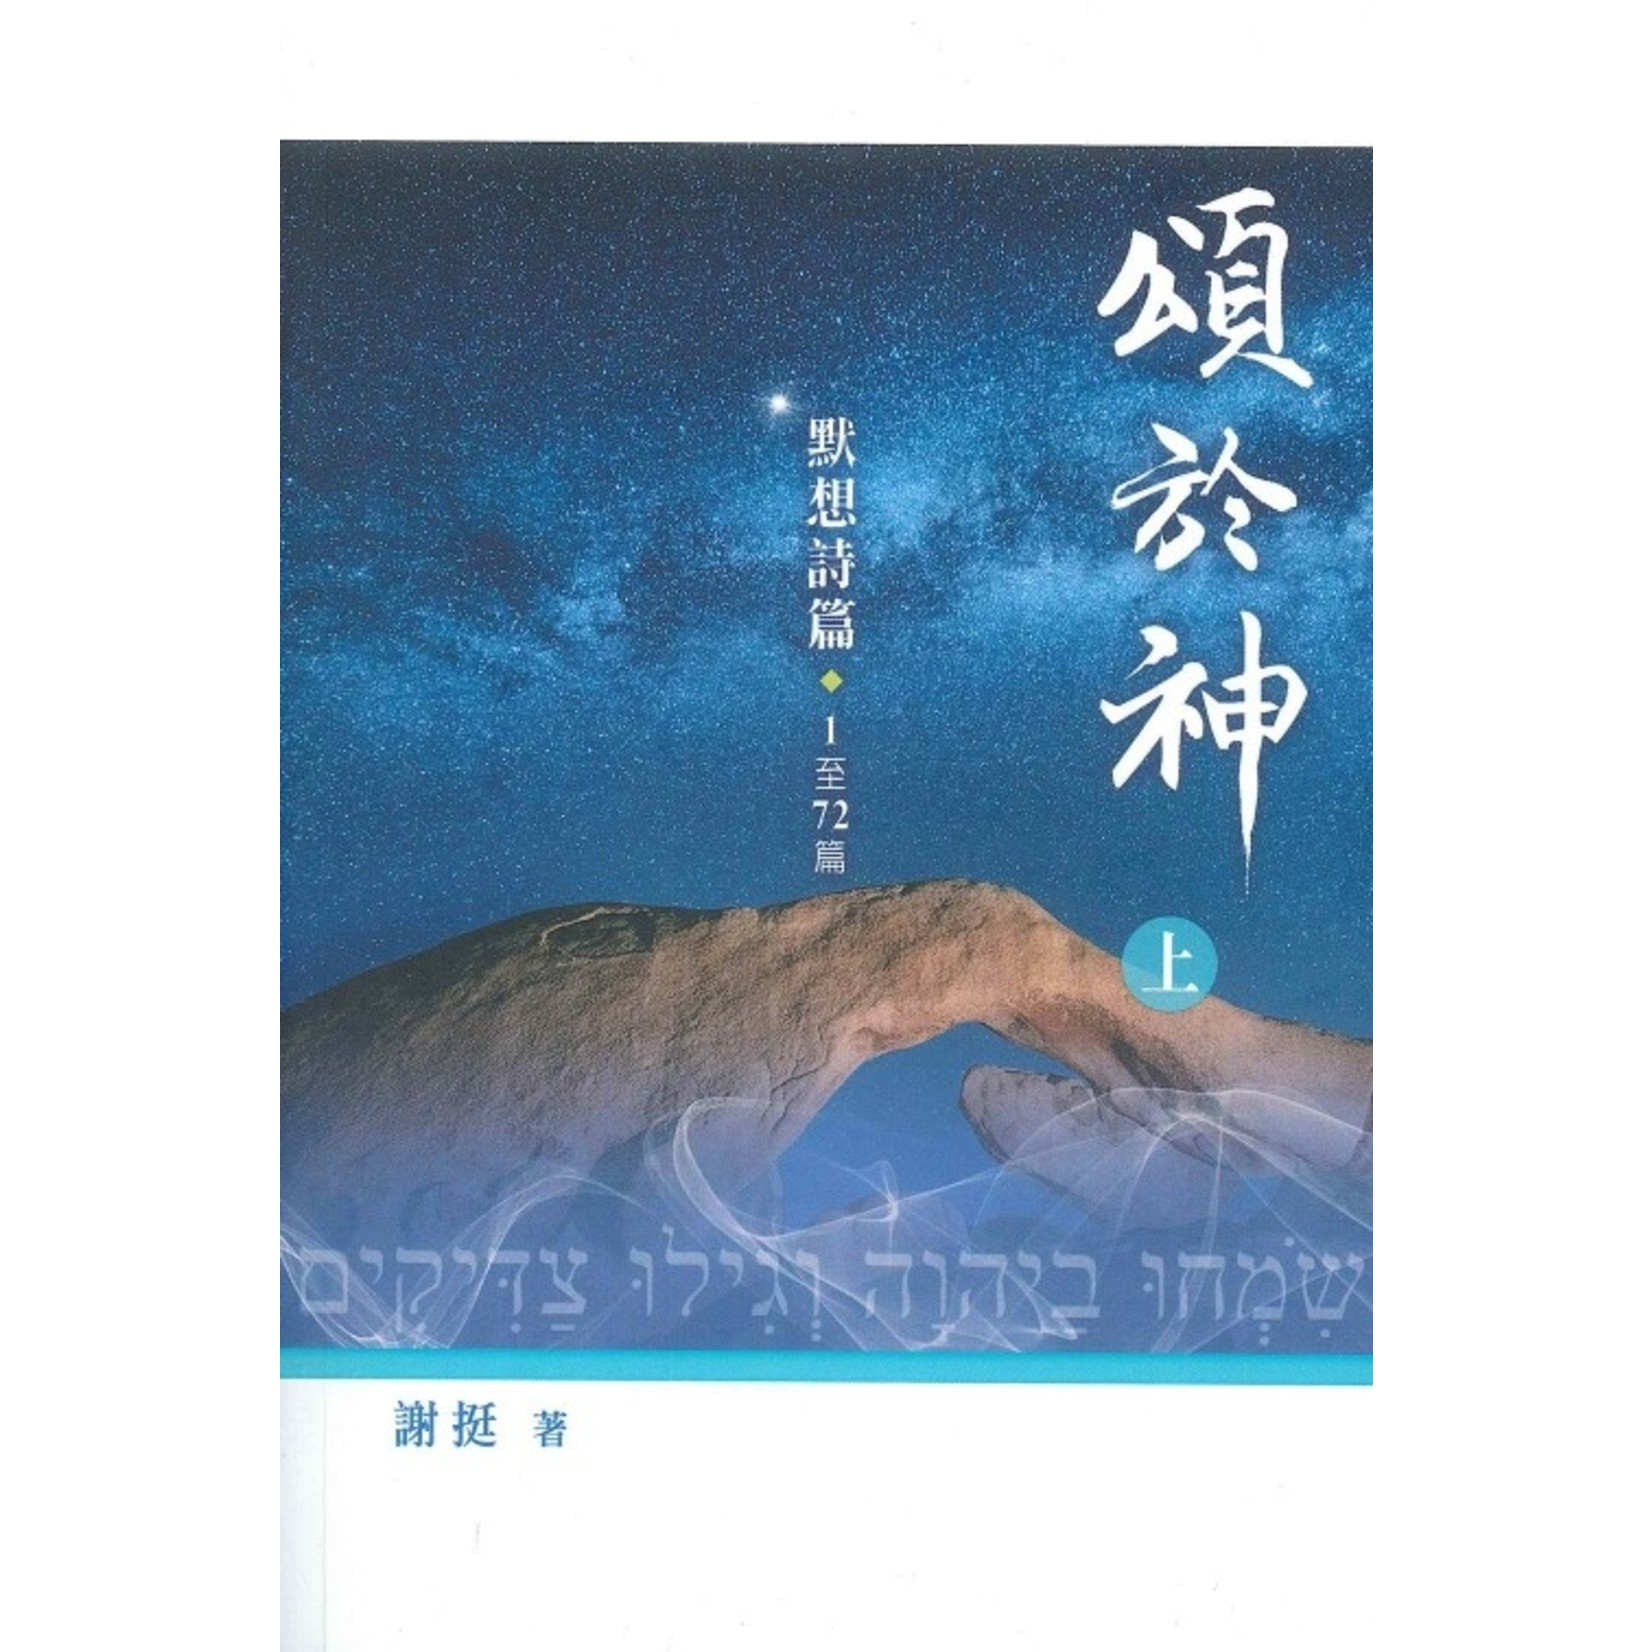 天道書樓 Tien Dao Publishing House 頌於神(上):默想詩篇1至72篇